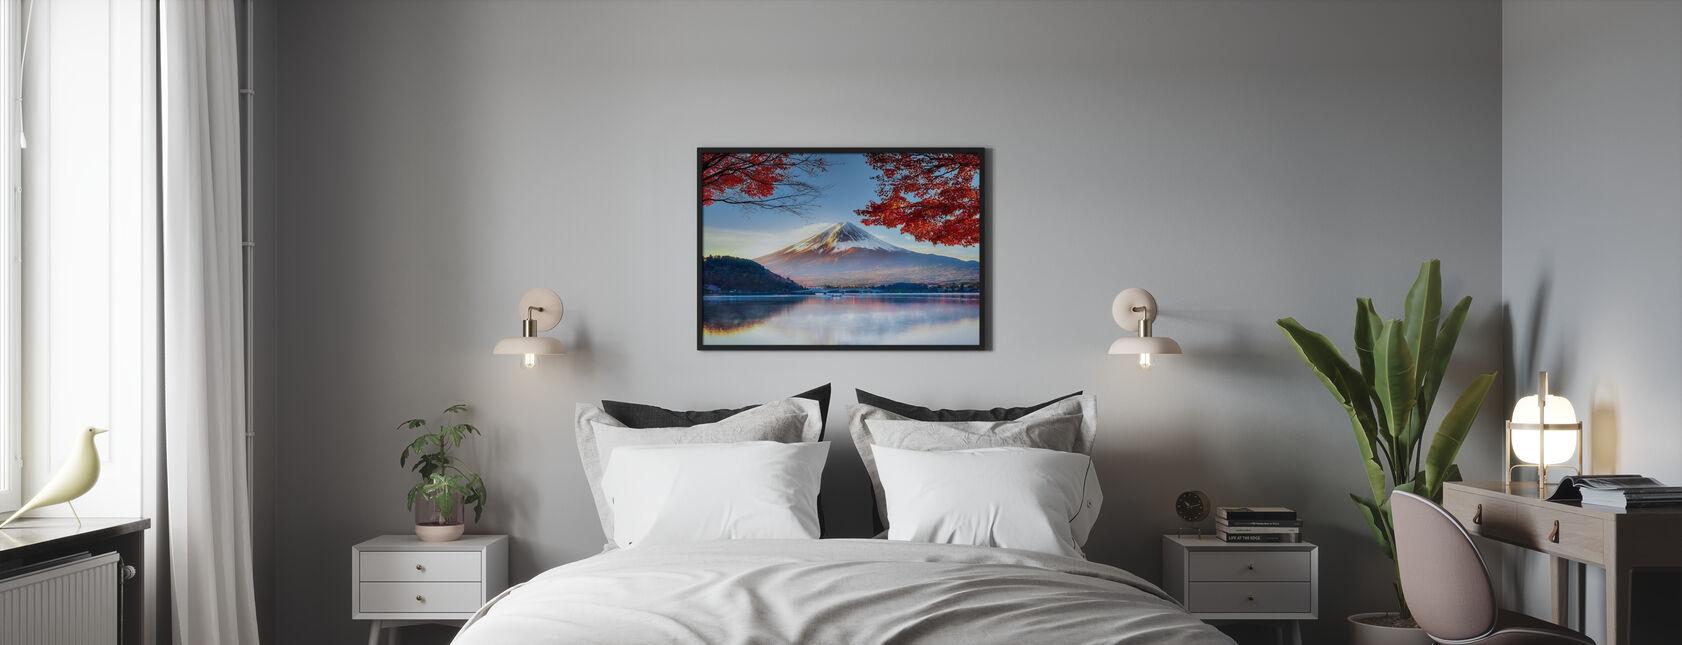 Fuji Mountain in Autumn - Framed print - Bedroom